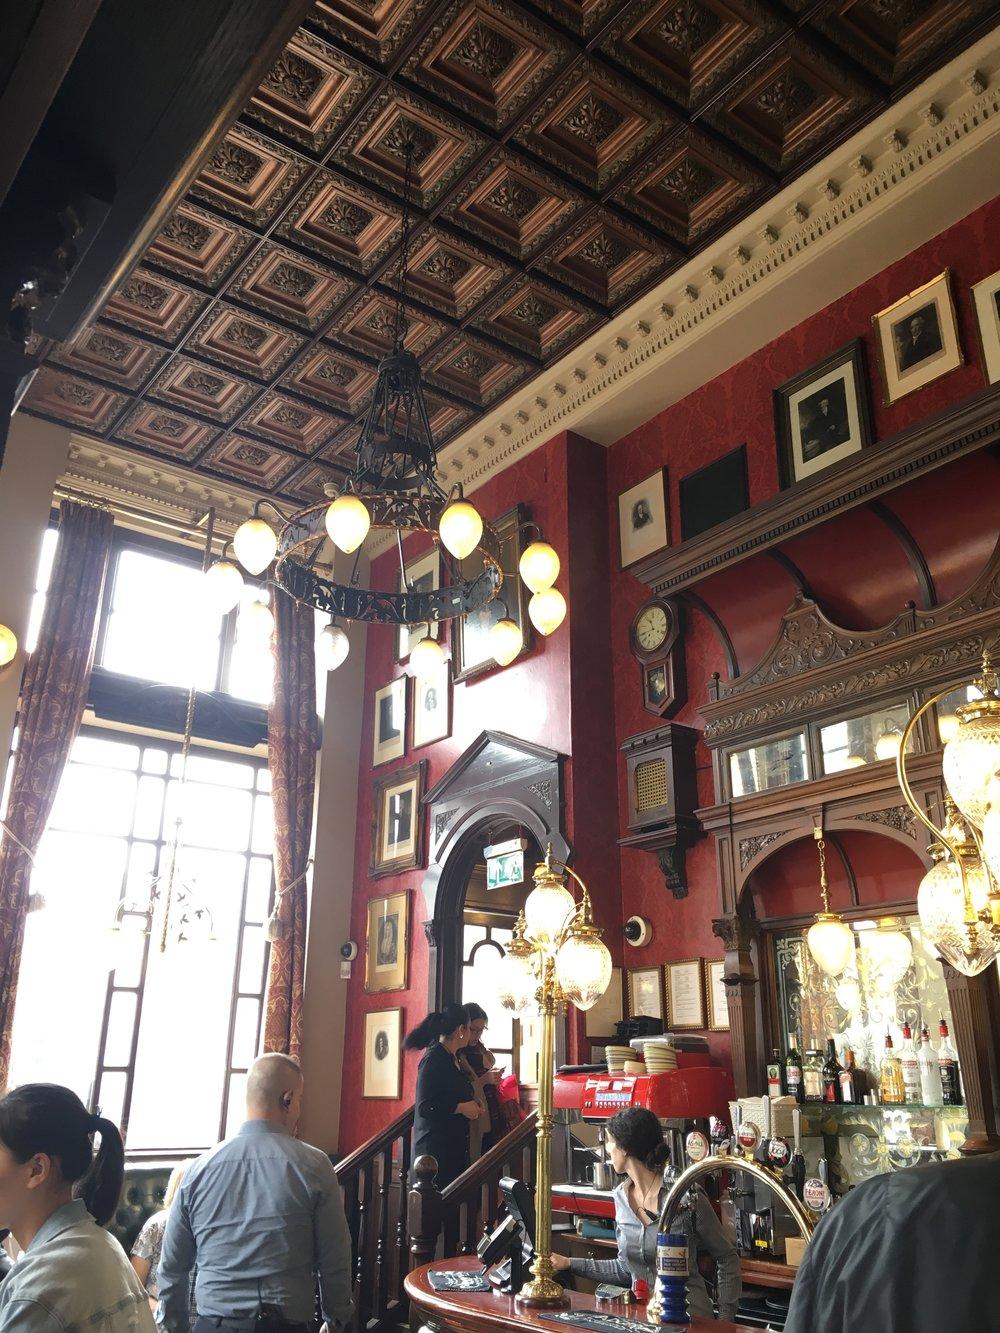 St Stephen's Tavern